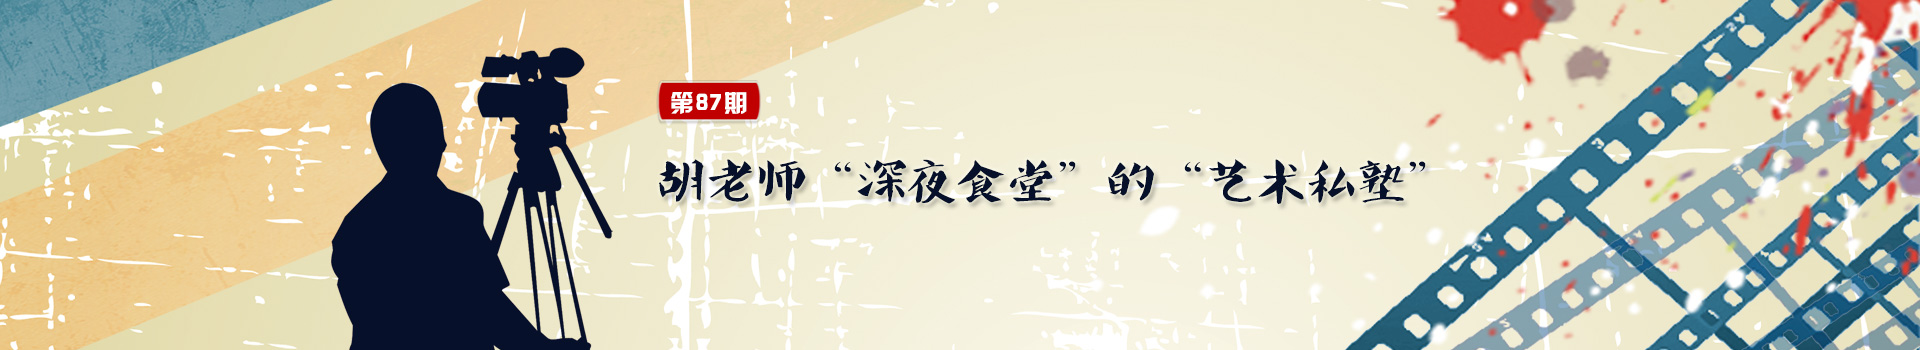 No.87三哥演义